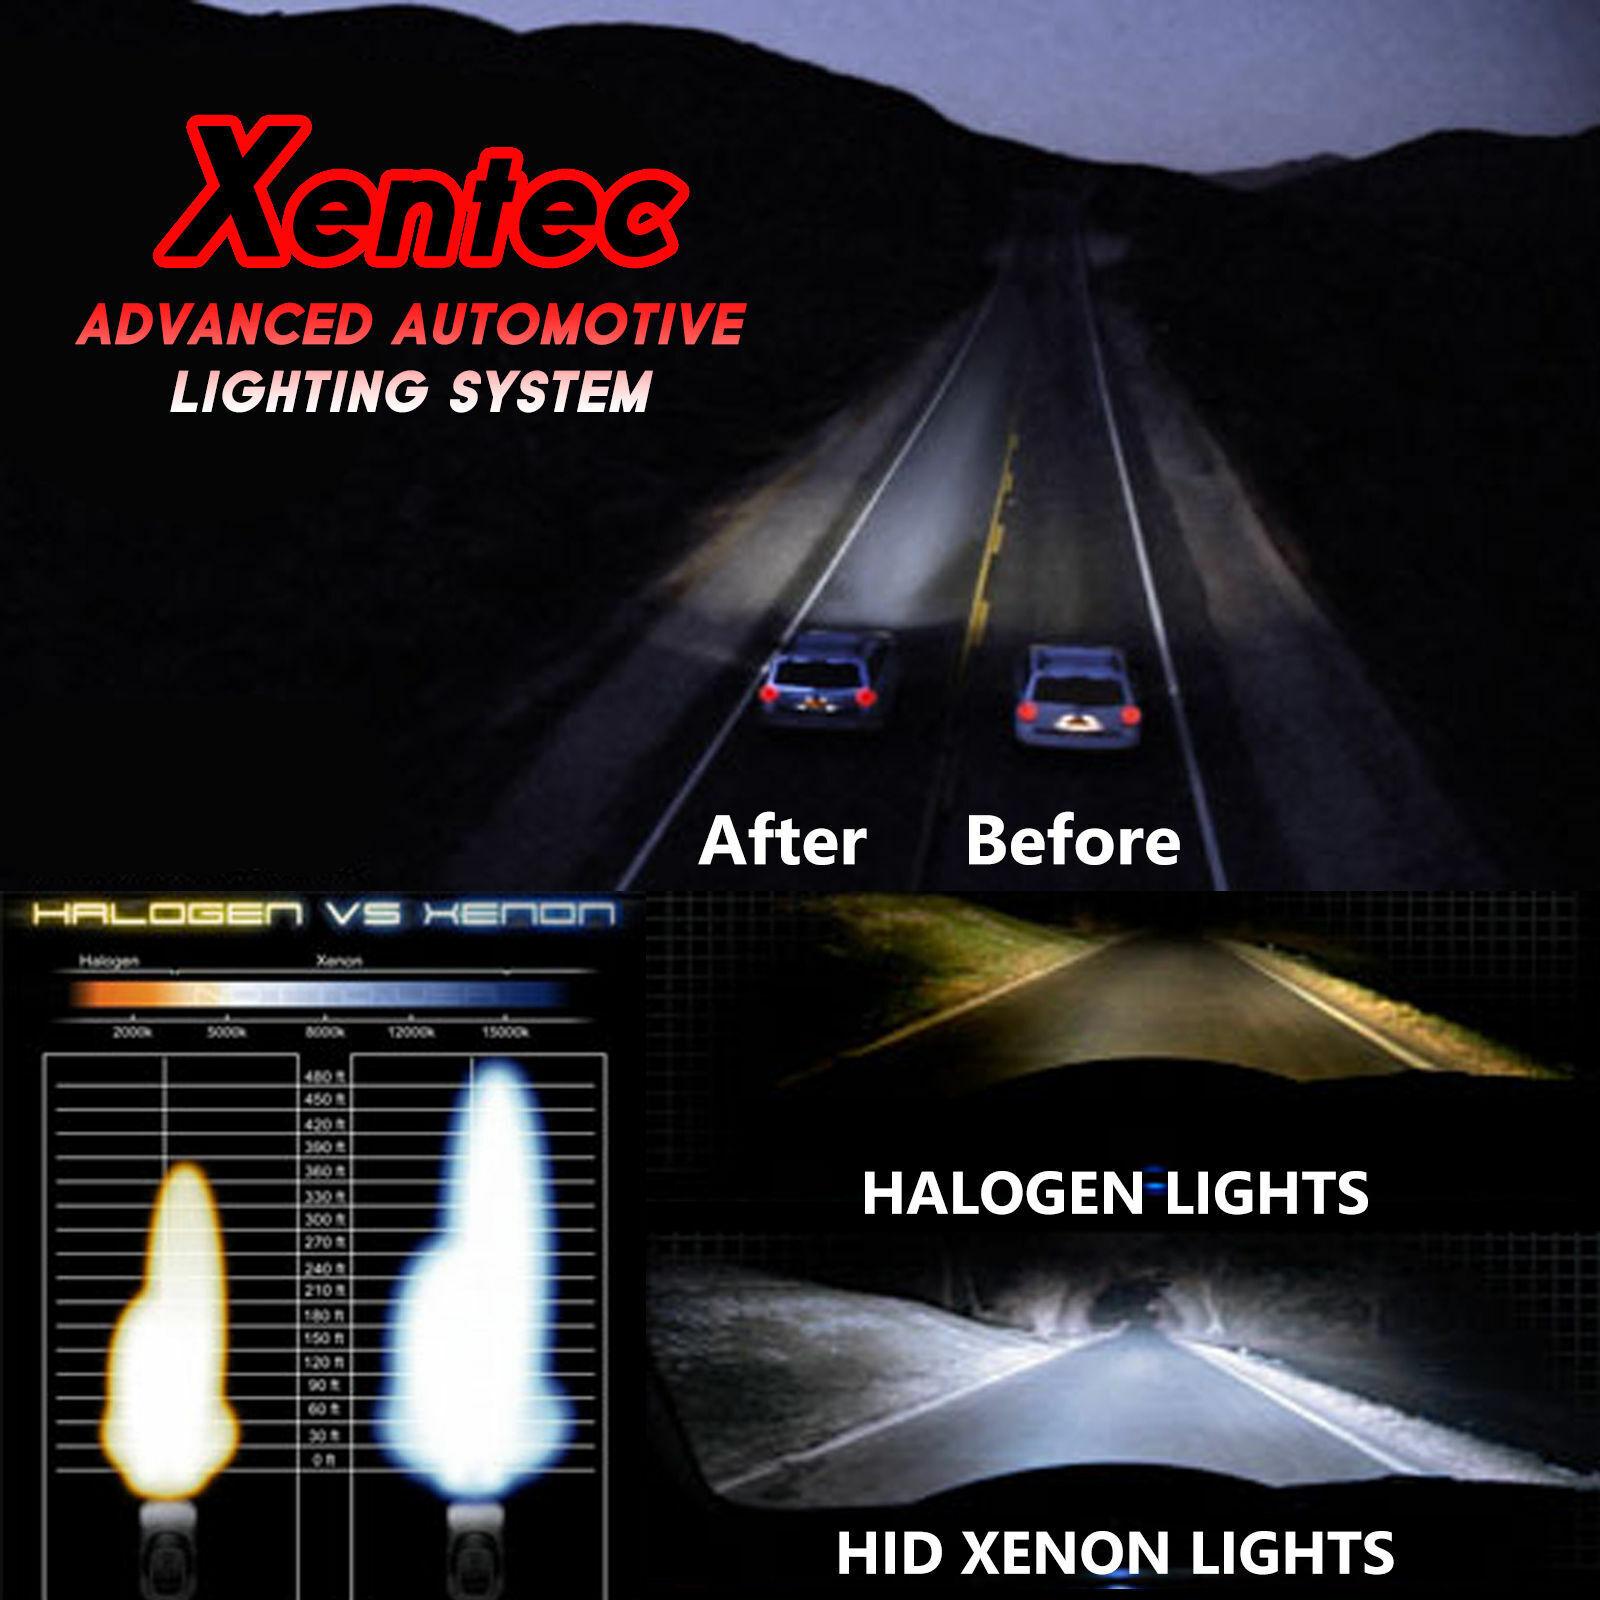 Xentec Xenon Headlight HID Kit for Honda Civic Accord H4 H11 9005 9006 880 H10 2